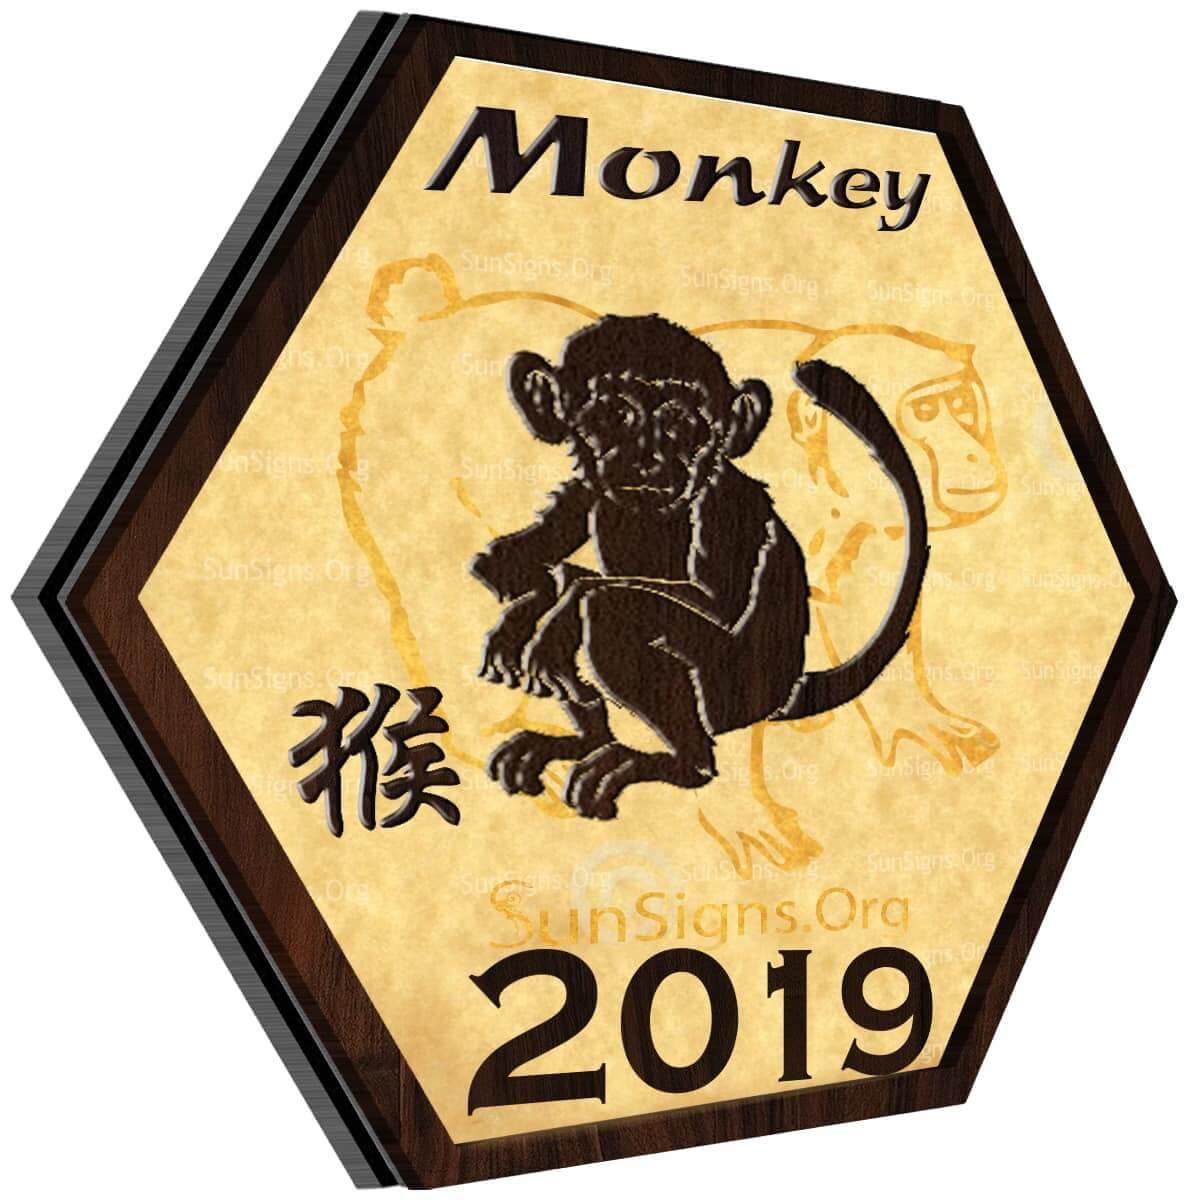 Monkey Horoscope 2019 Predictions For Love, Finance, Career, Health And Family